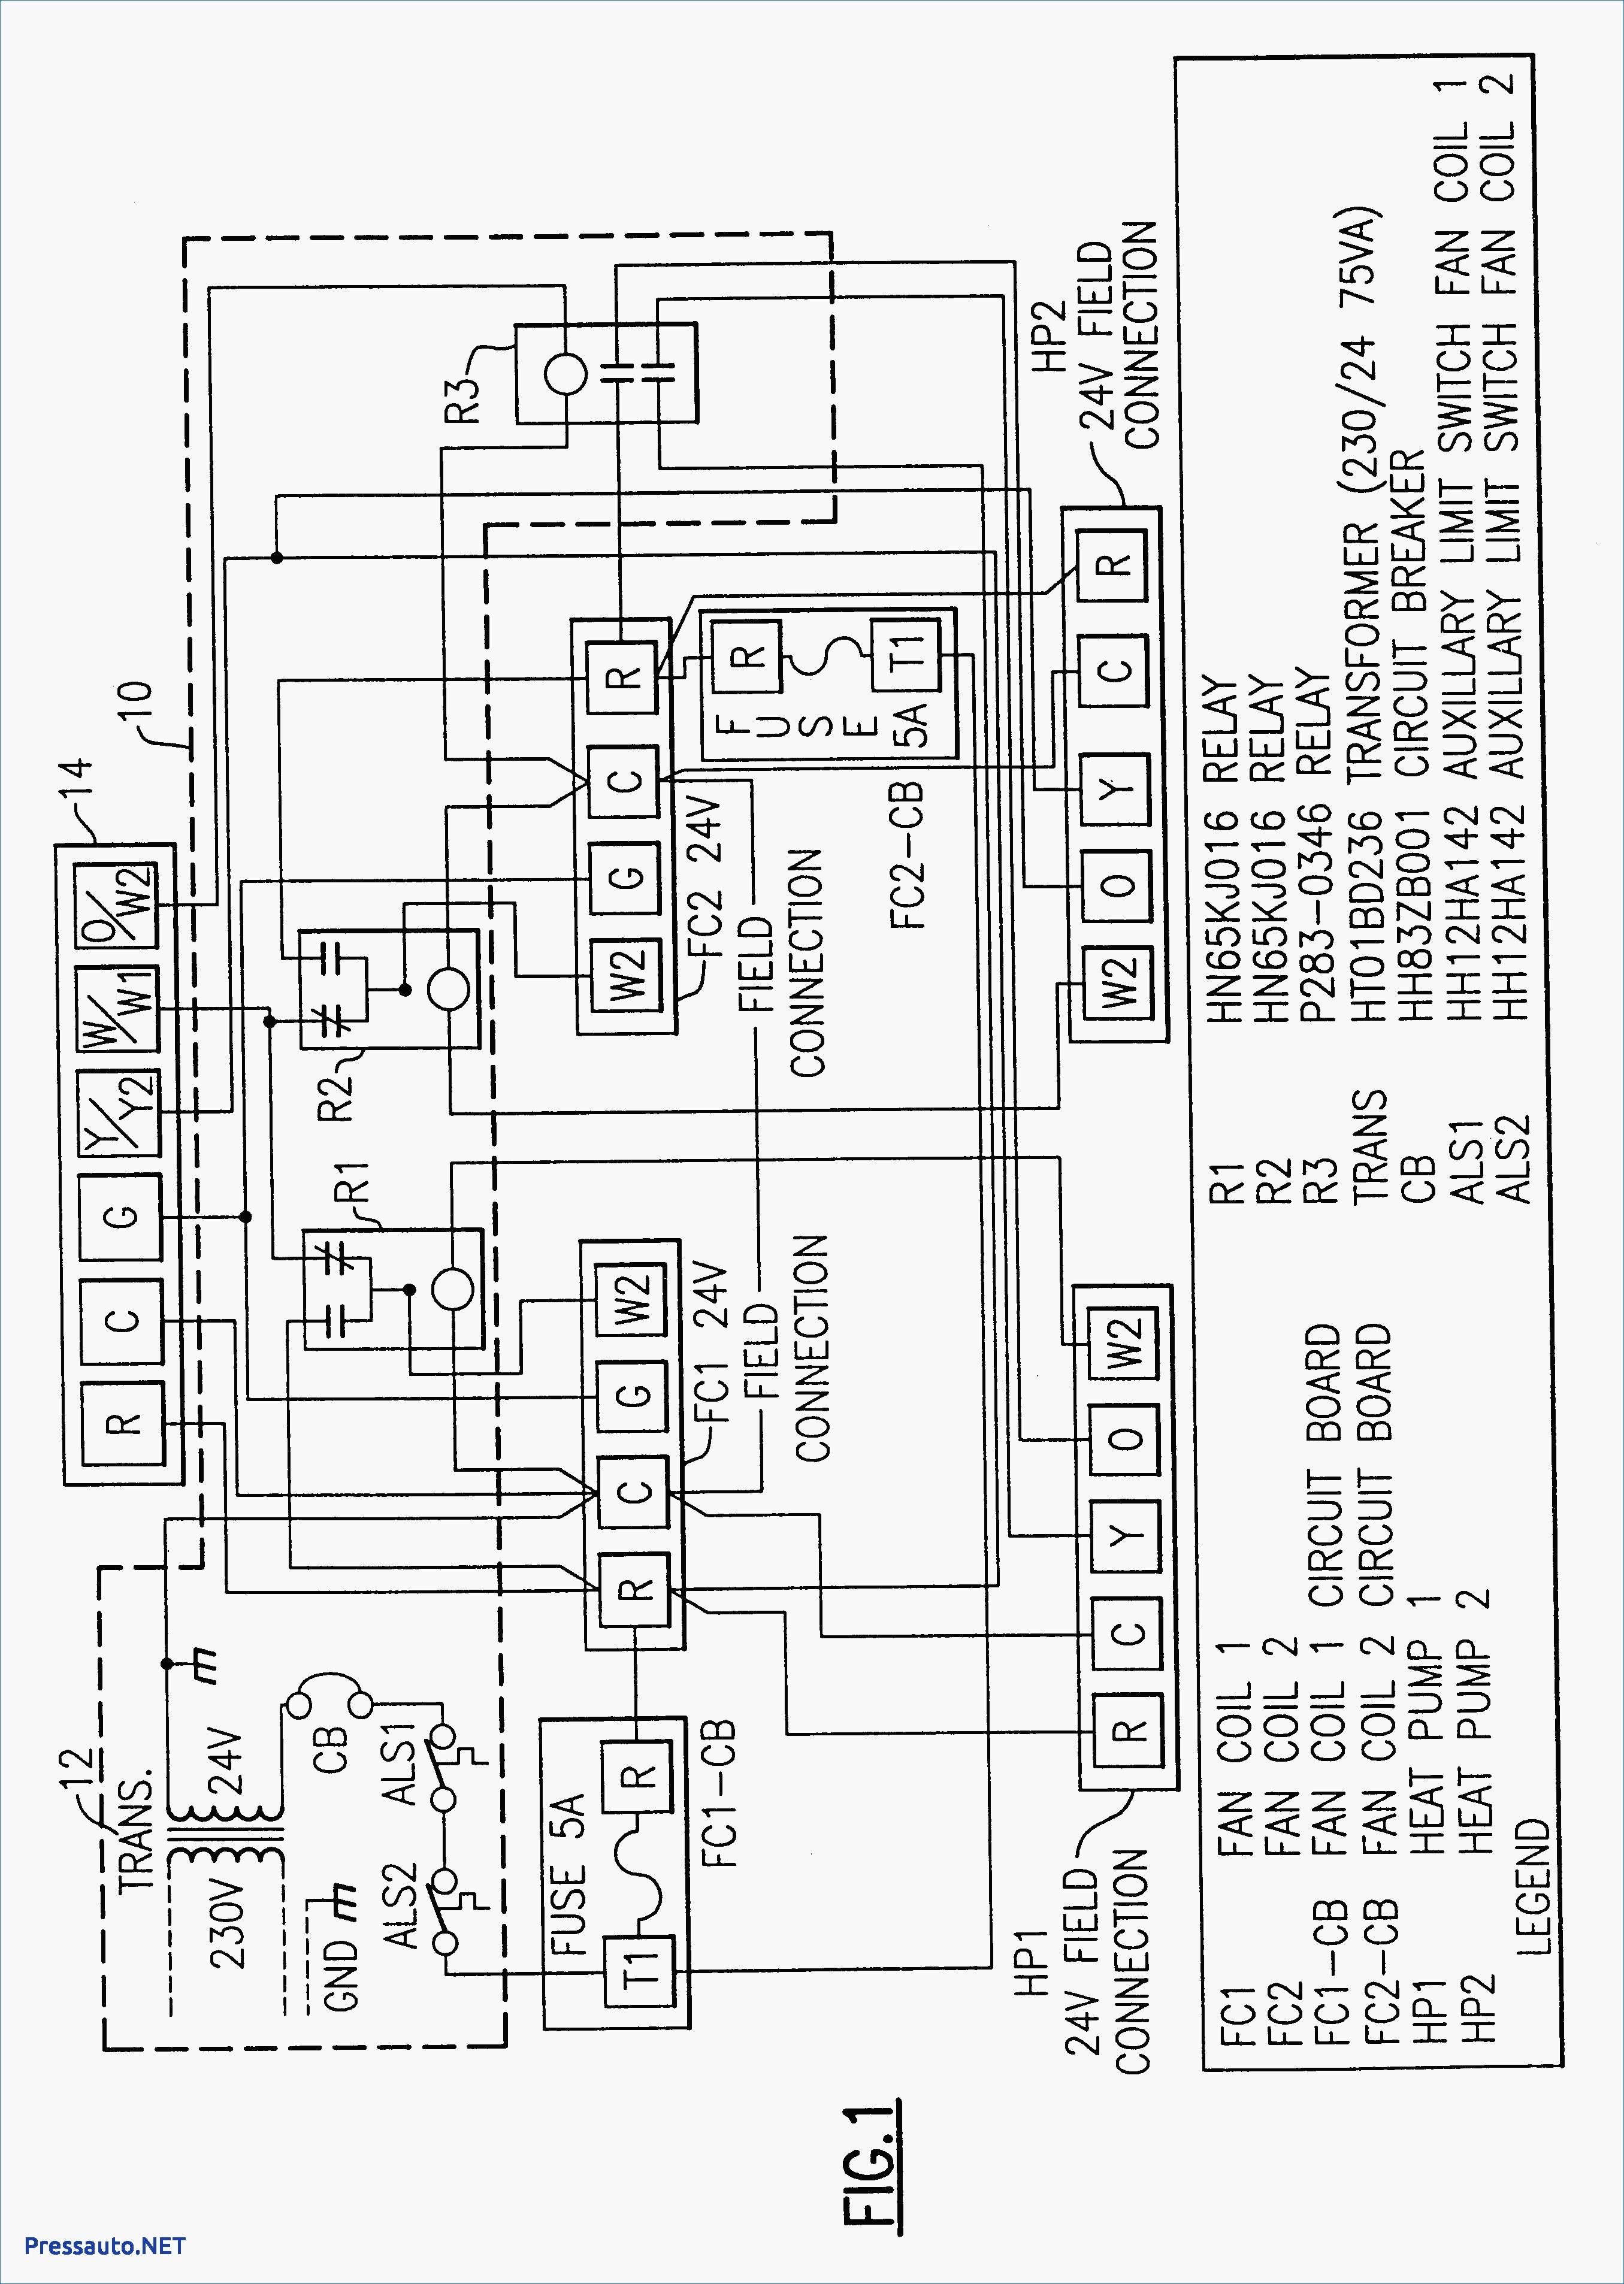 wiring diagram understanding